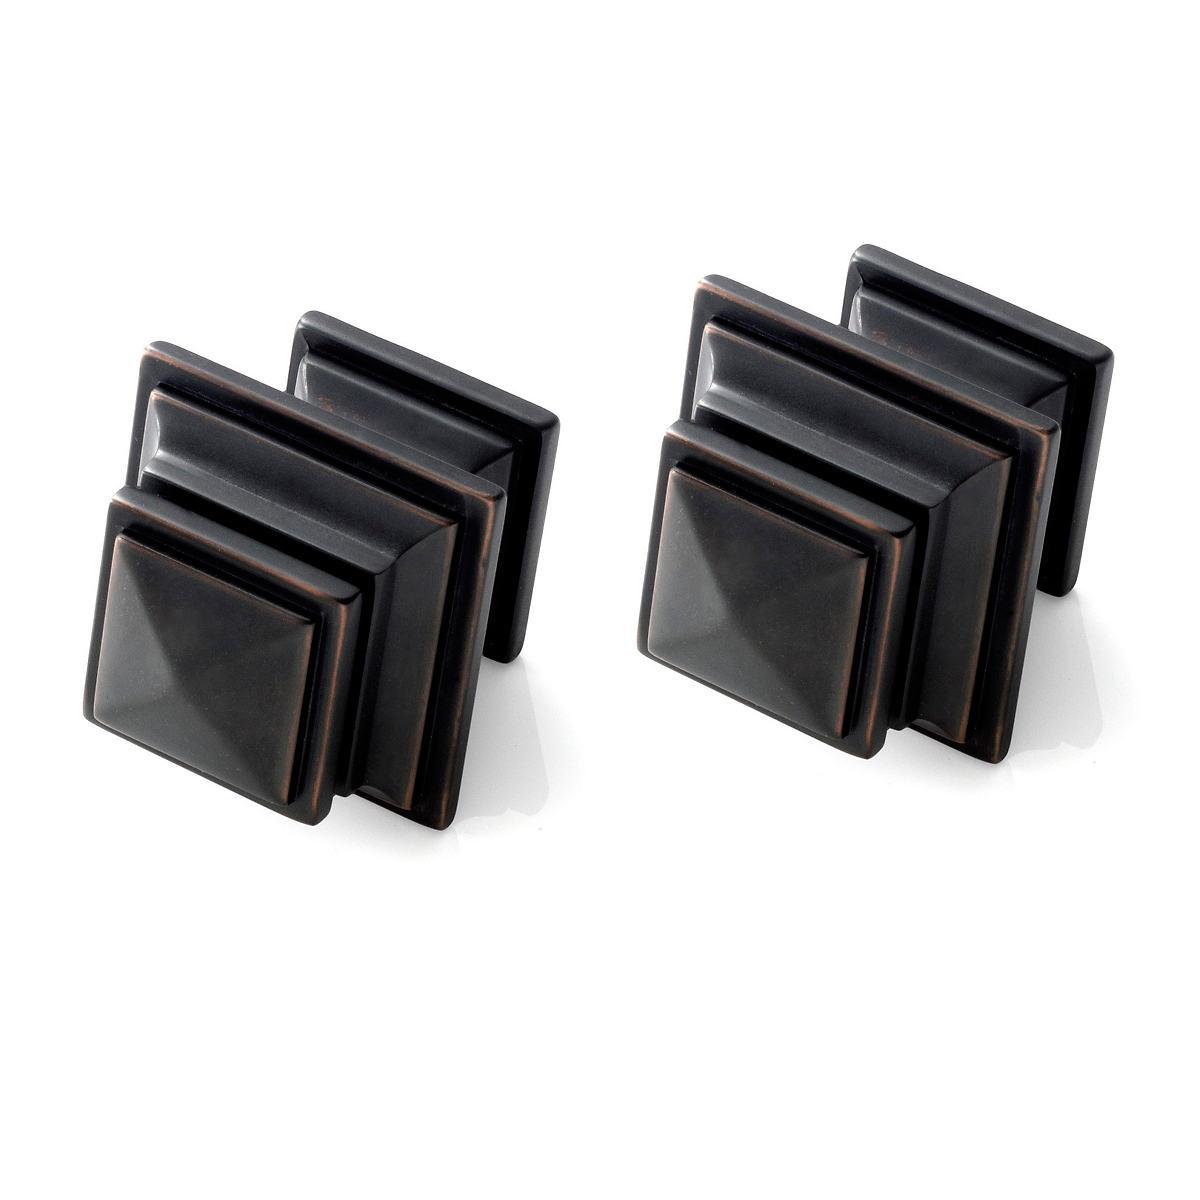 Square Oil Rubbed Bronze Finials/Set of 2